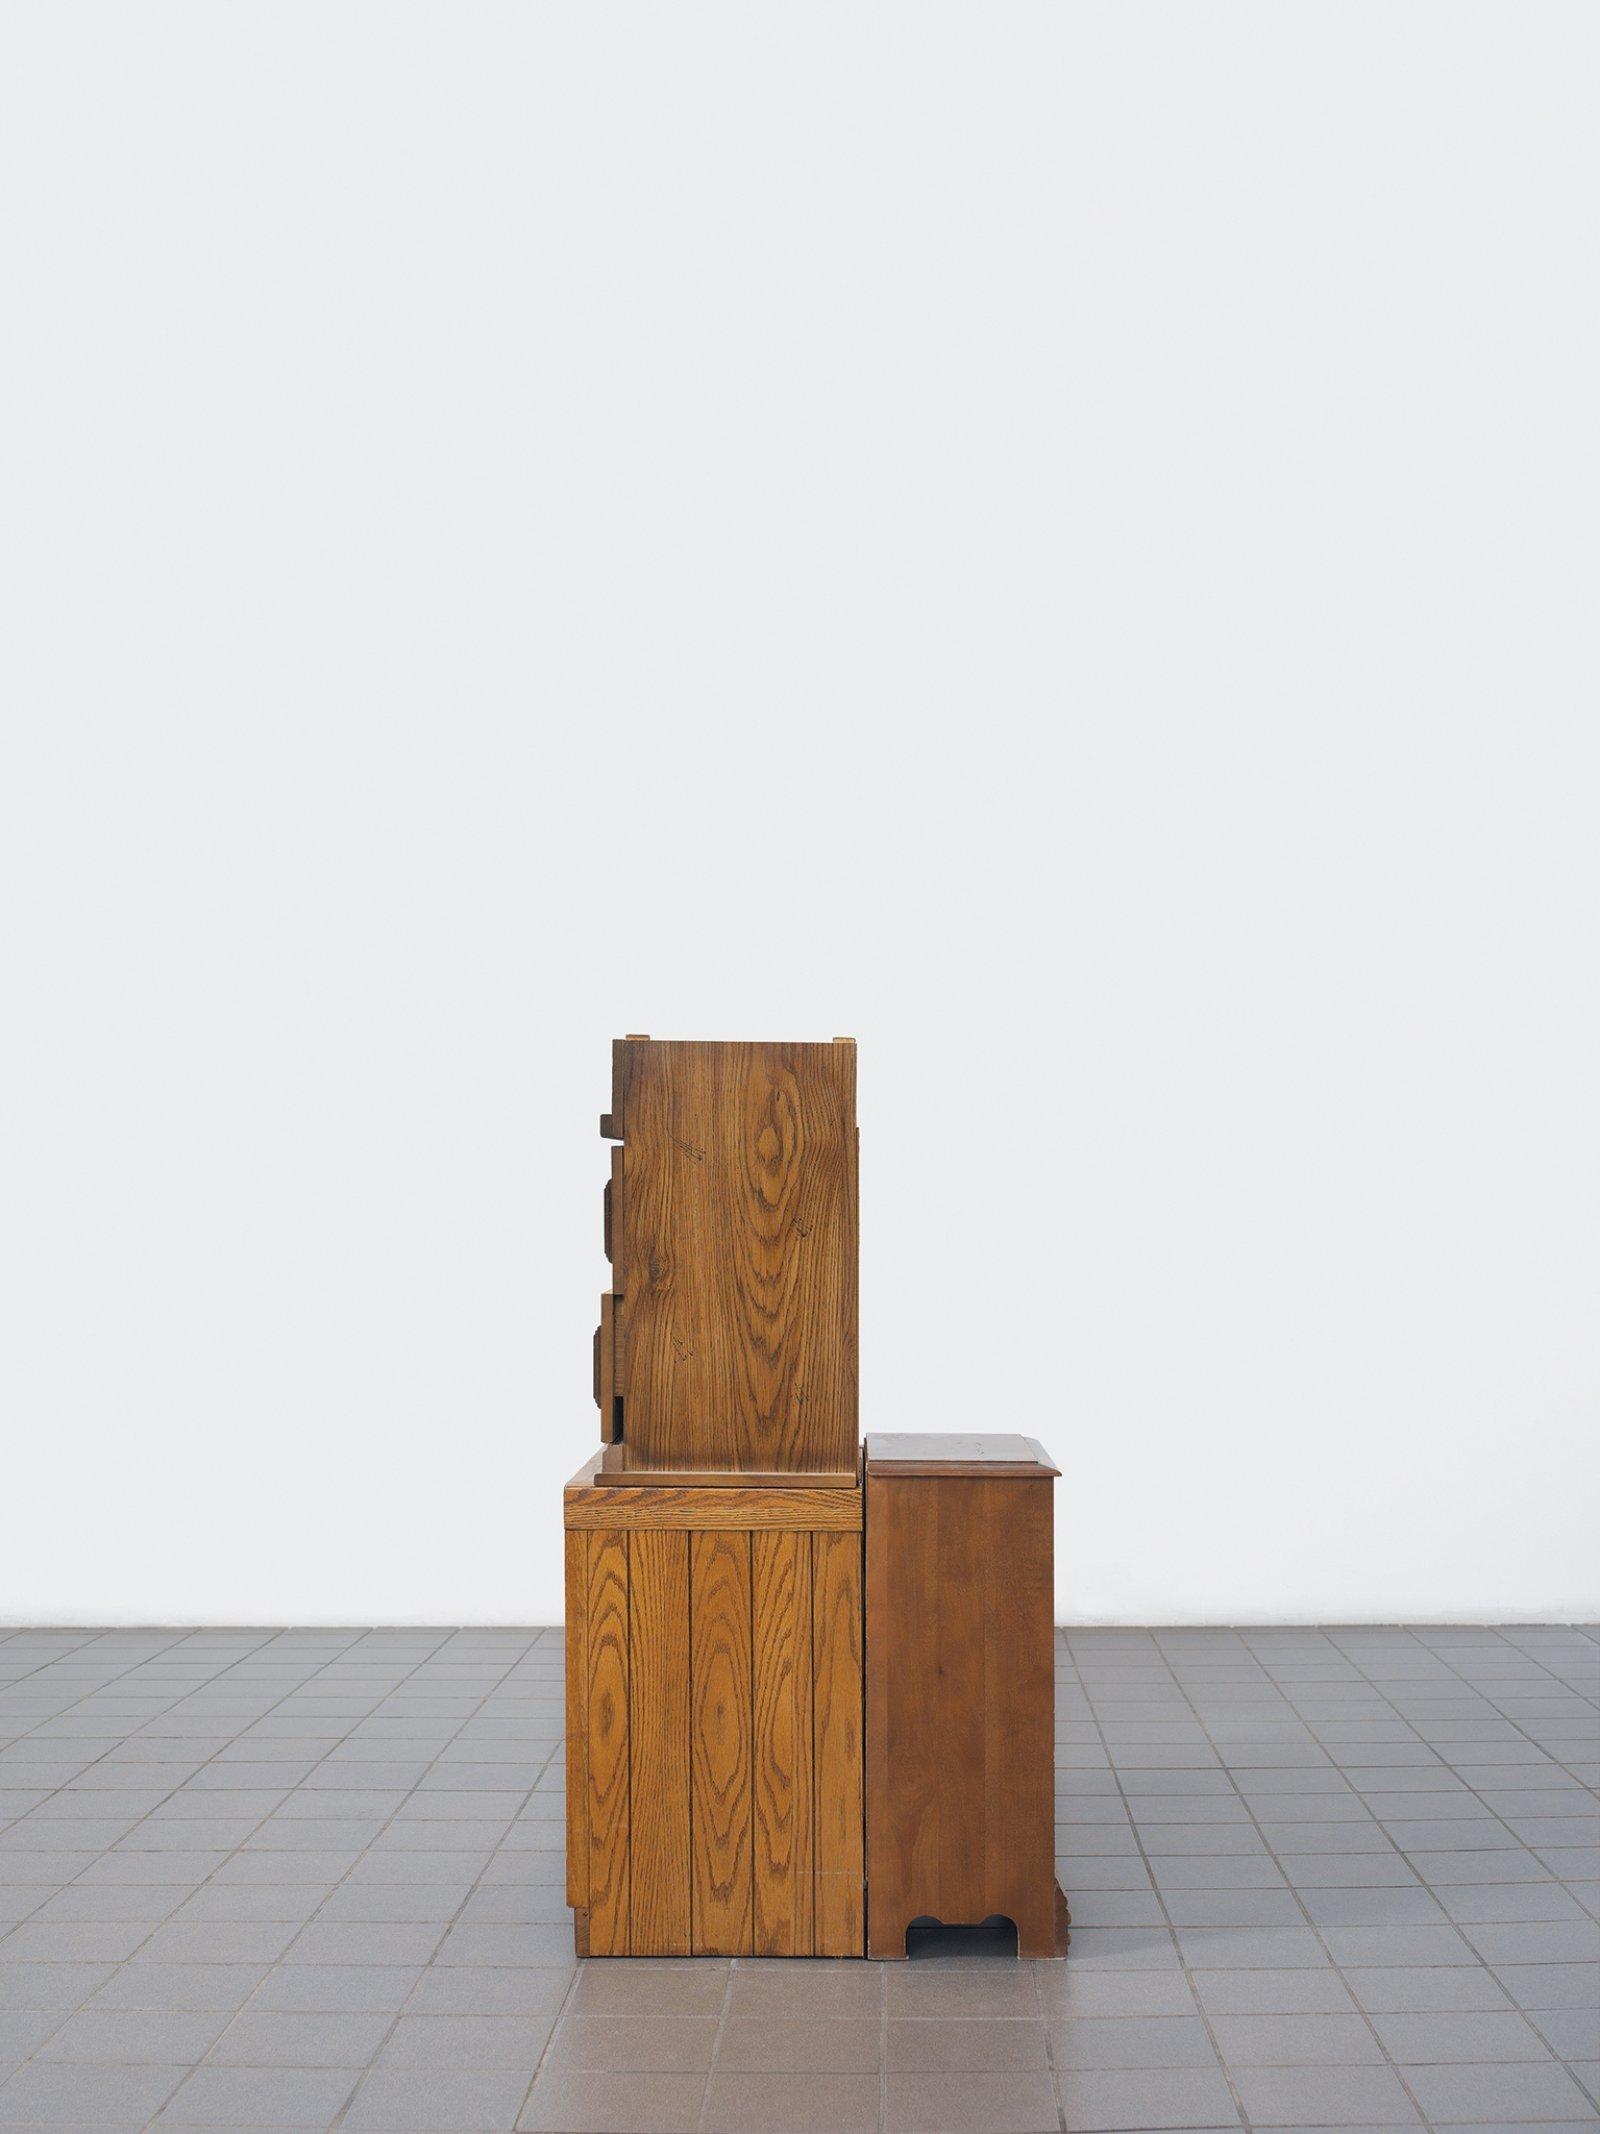 Geoffrey Farmer, Cliff Face (Pale Fire Freedom Machine), 2005, lightjet (endura archival photo paper), 50 x 38 in. (126 x 97 cm)